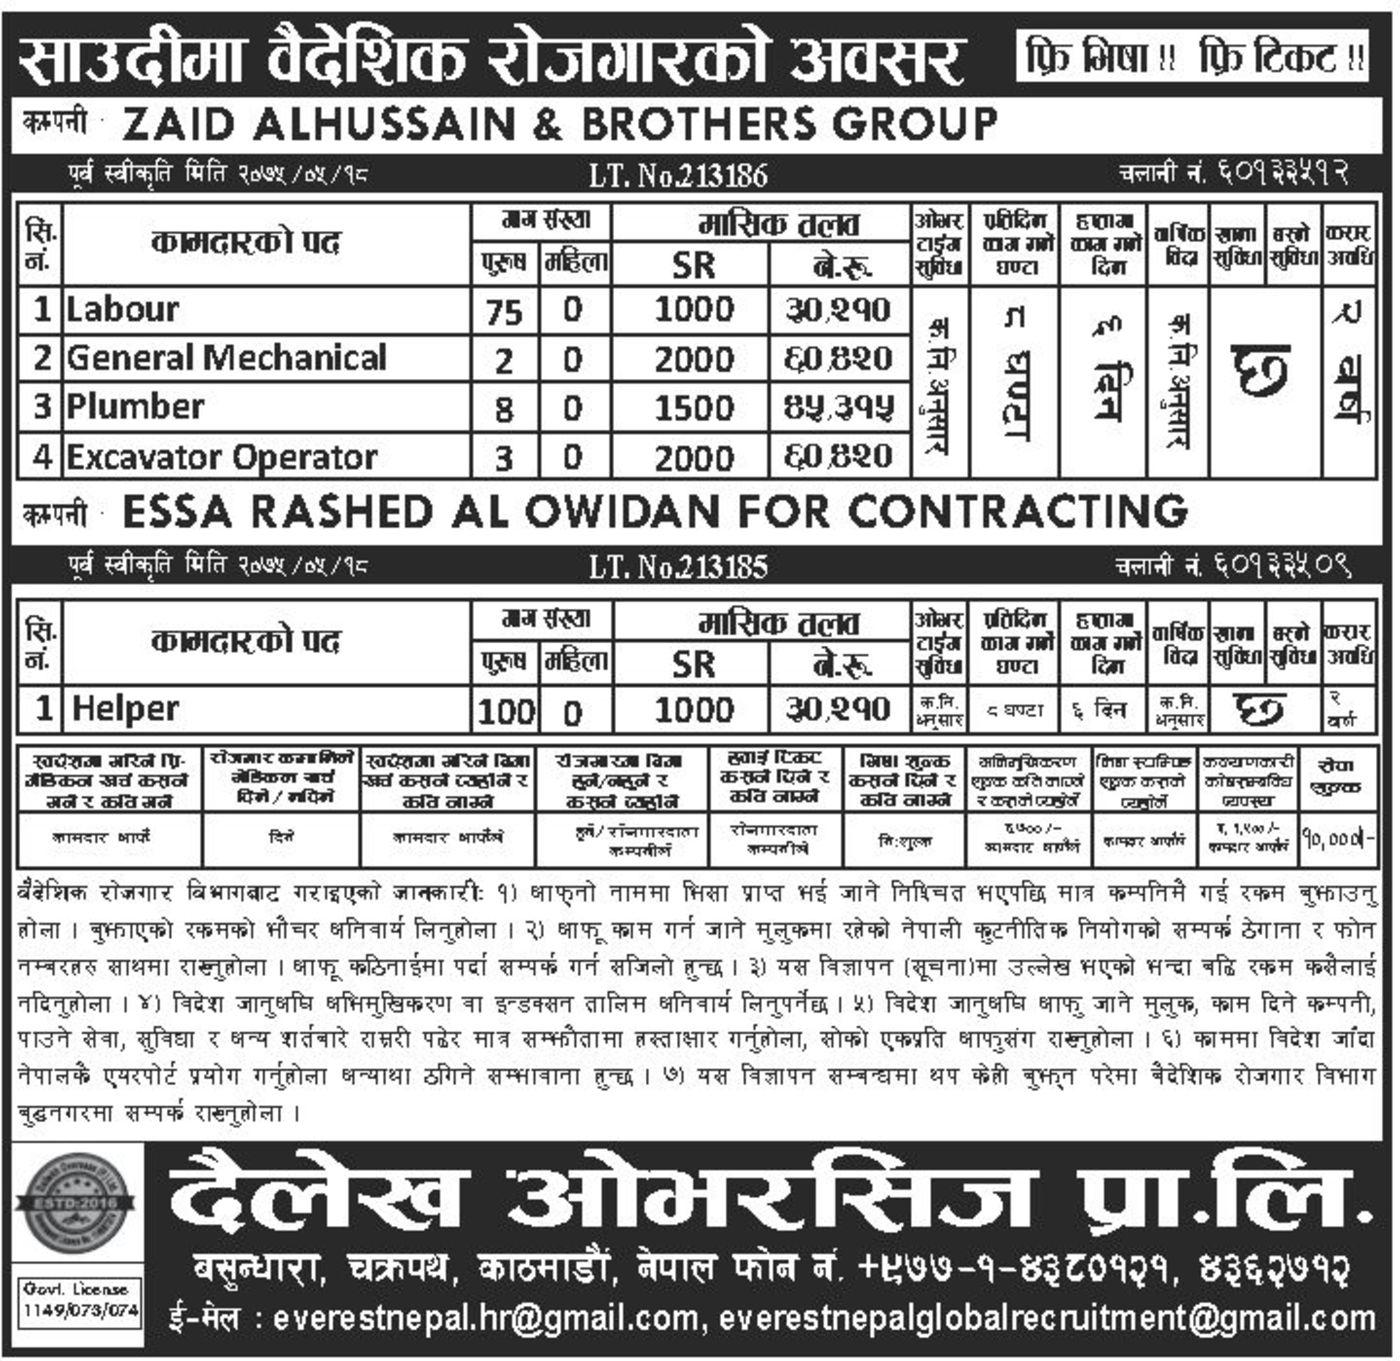 Jobs Nepal - Saudi Arabia Vacancy - Labour, Plumber